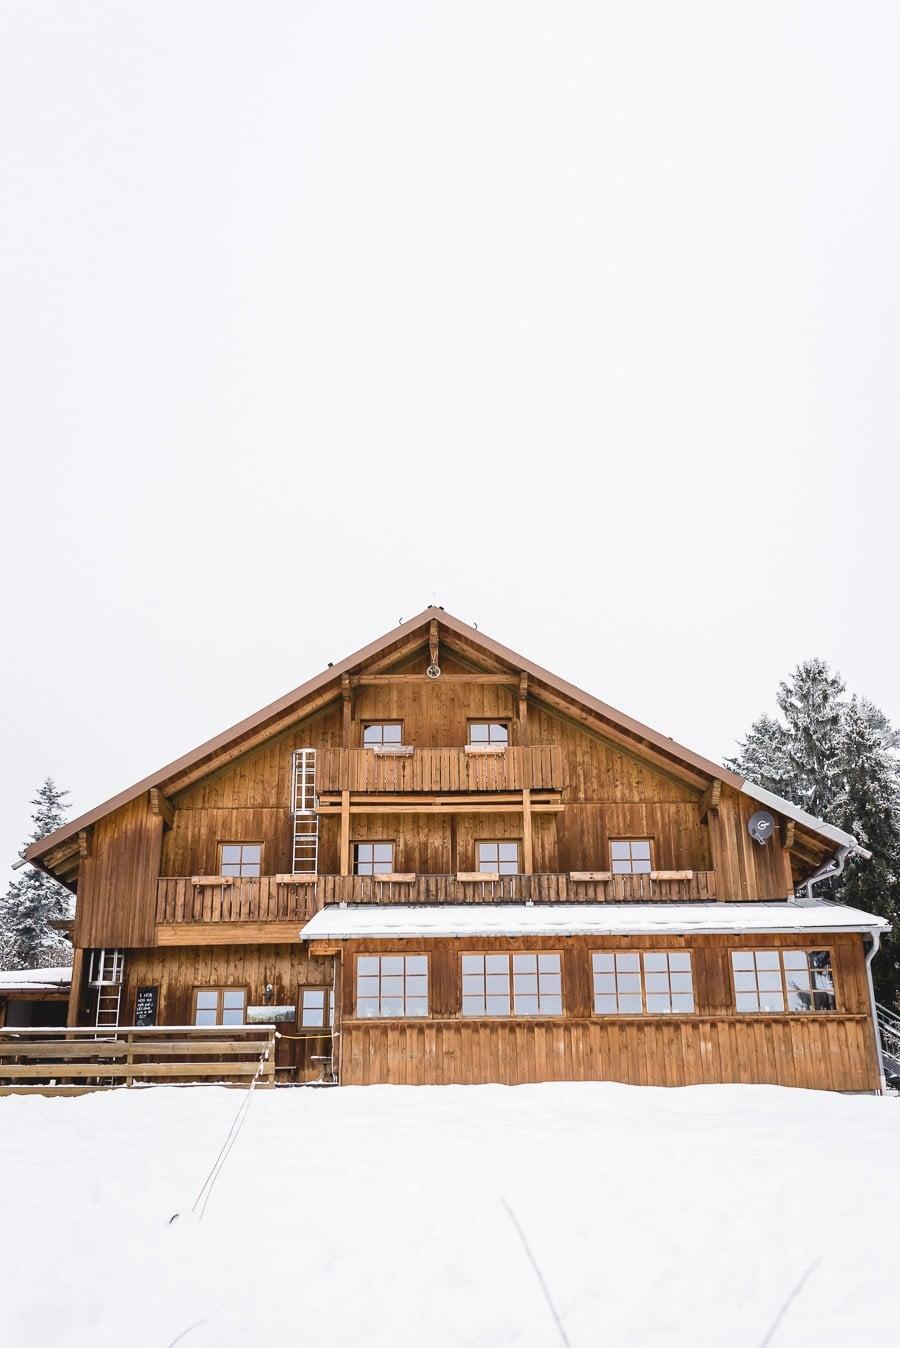 Berghochzeit Tirol Heiraten In Den Bergen Tirols